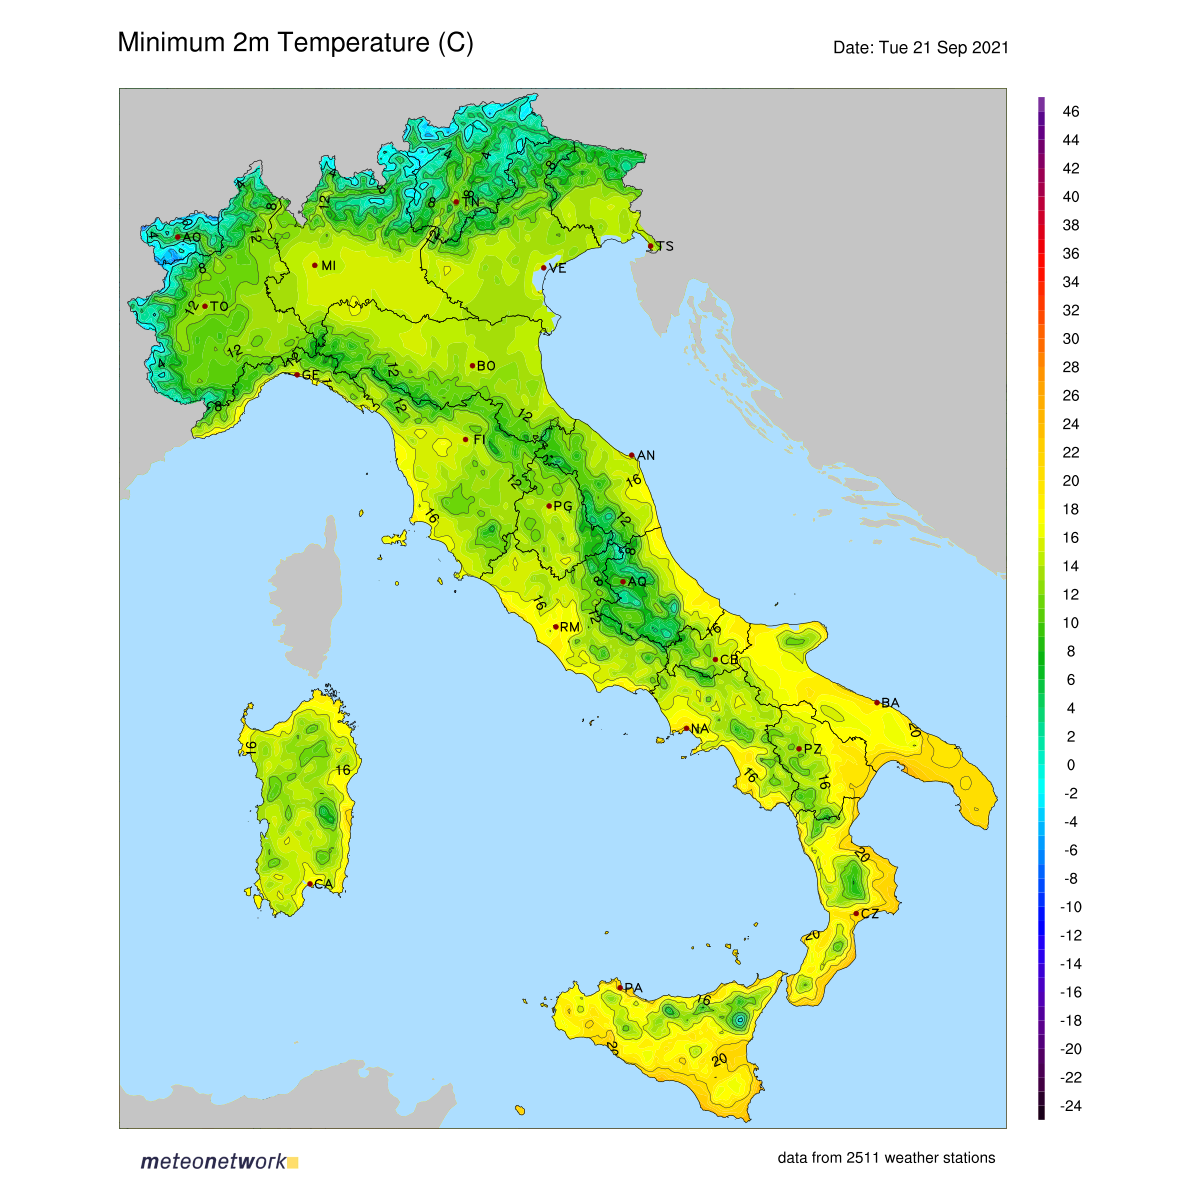 Dati Meteo 2021-09-21 temp_min_italia